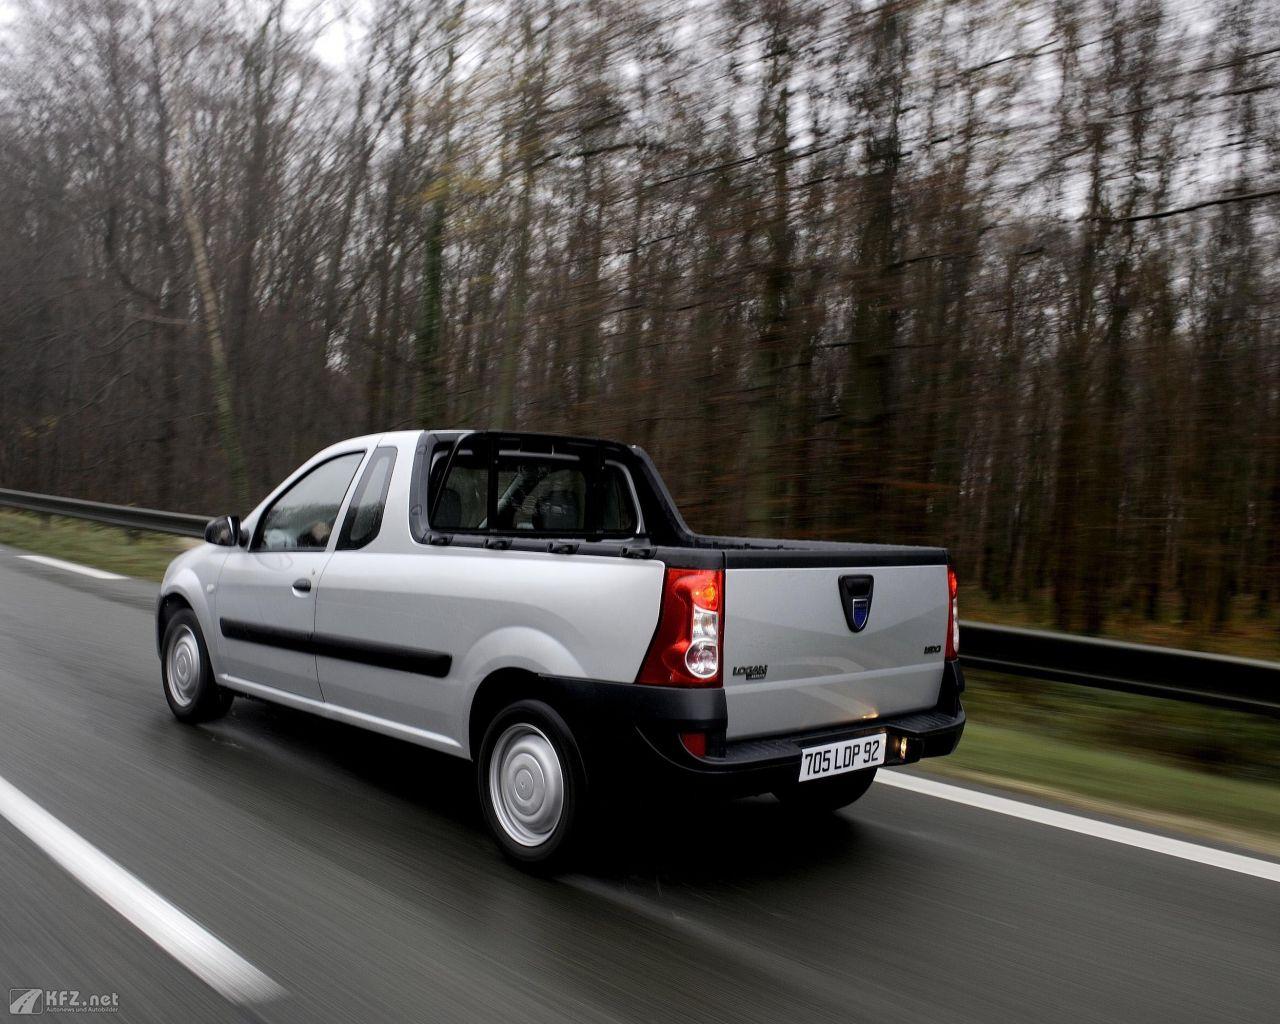 dacia-pick-up-1280x1024-41